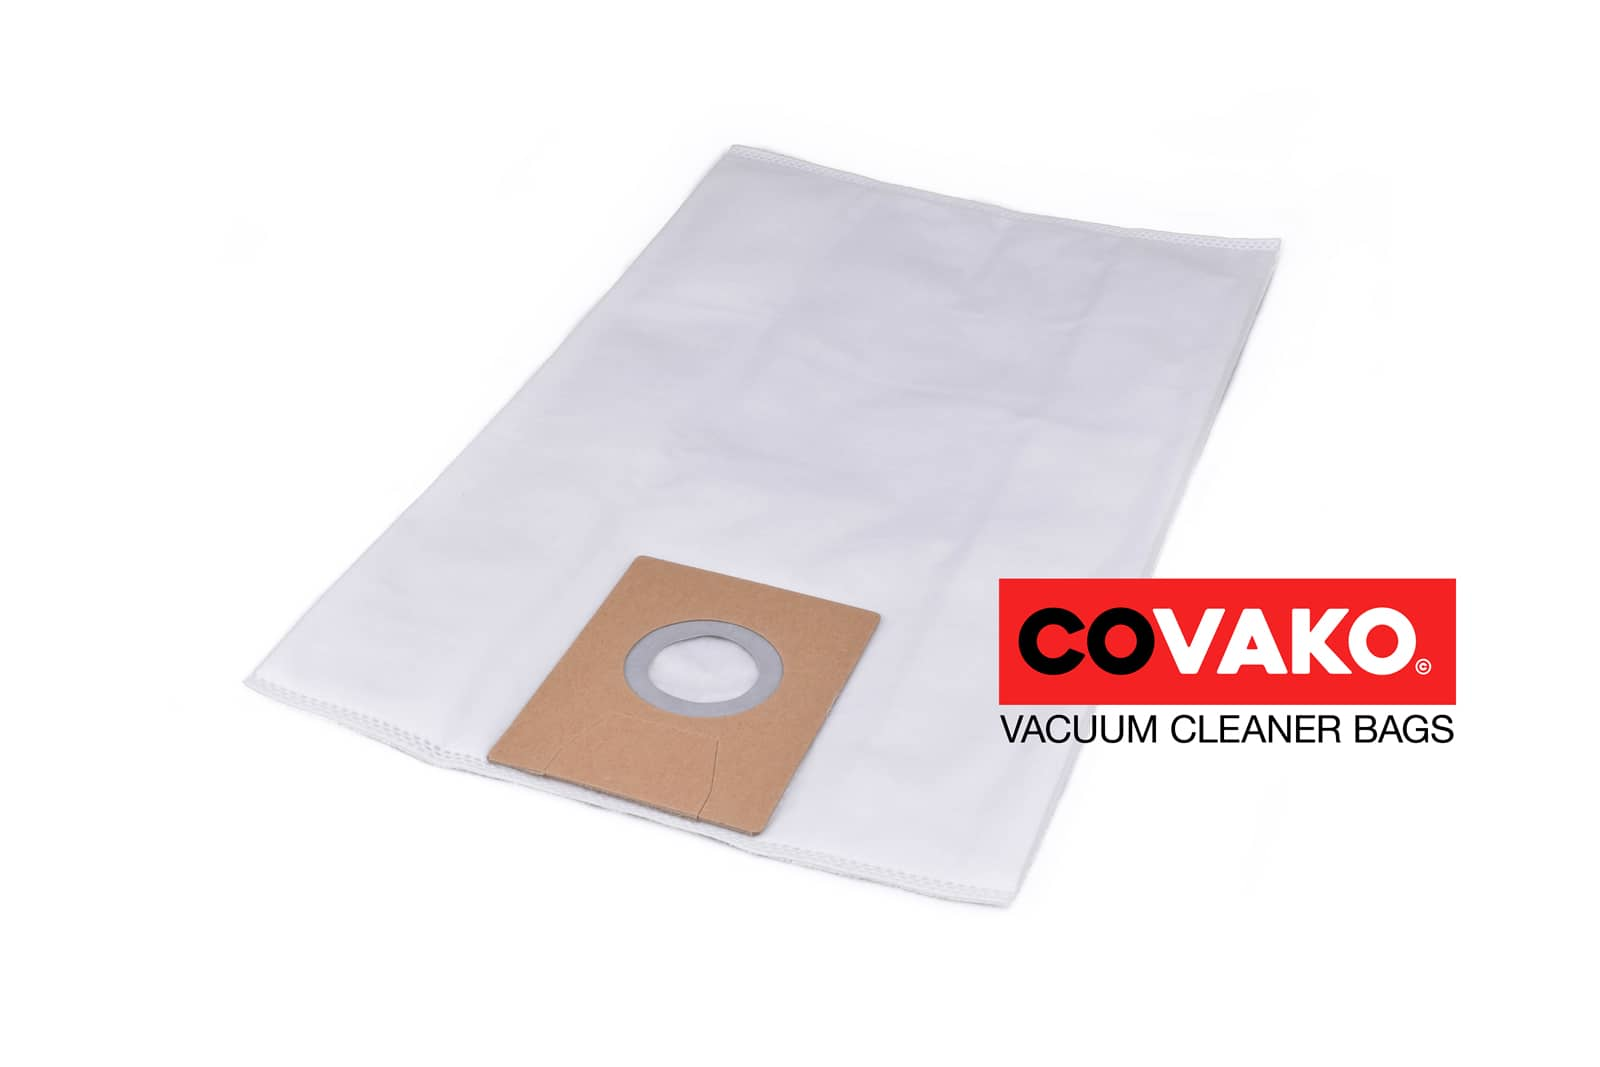 I-vac CA 30 / Synthesis - I-vac vacuum cleaner bags